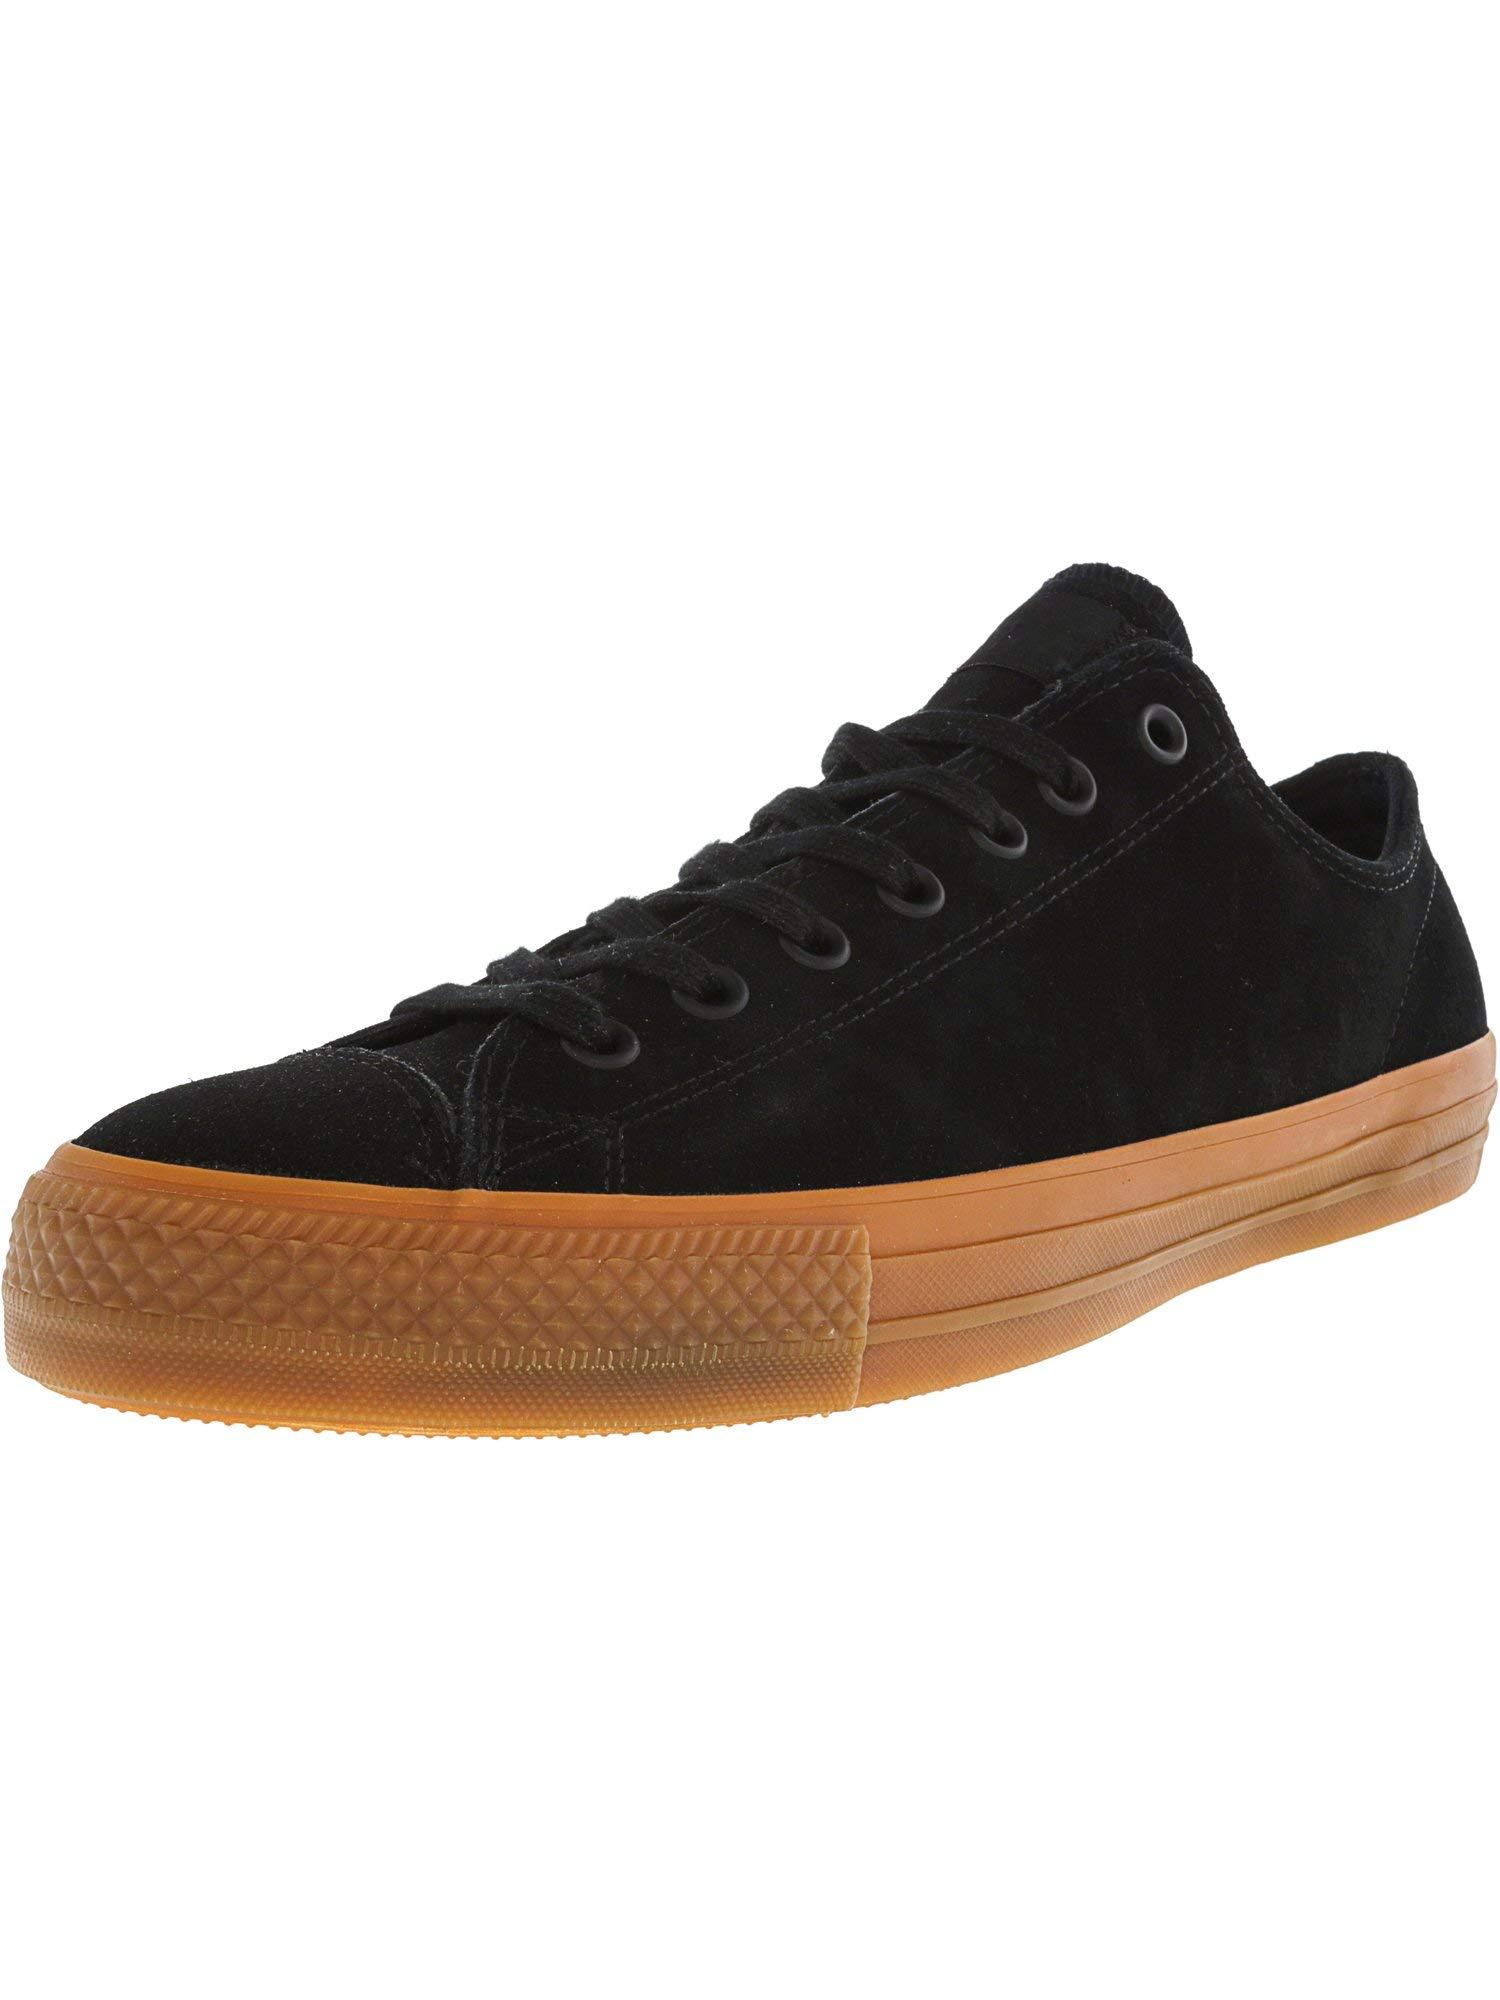 303e04a4da36cd Galleon - Converse Chuck Taylor All Star Pro Ox Black Ankle-High Leather  Fashion Sneaker - 14M 12M